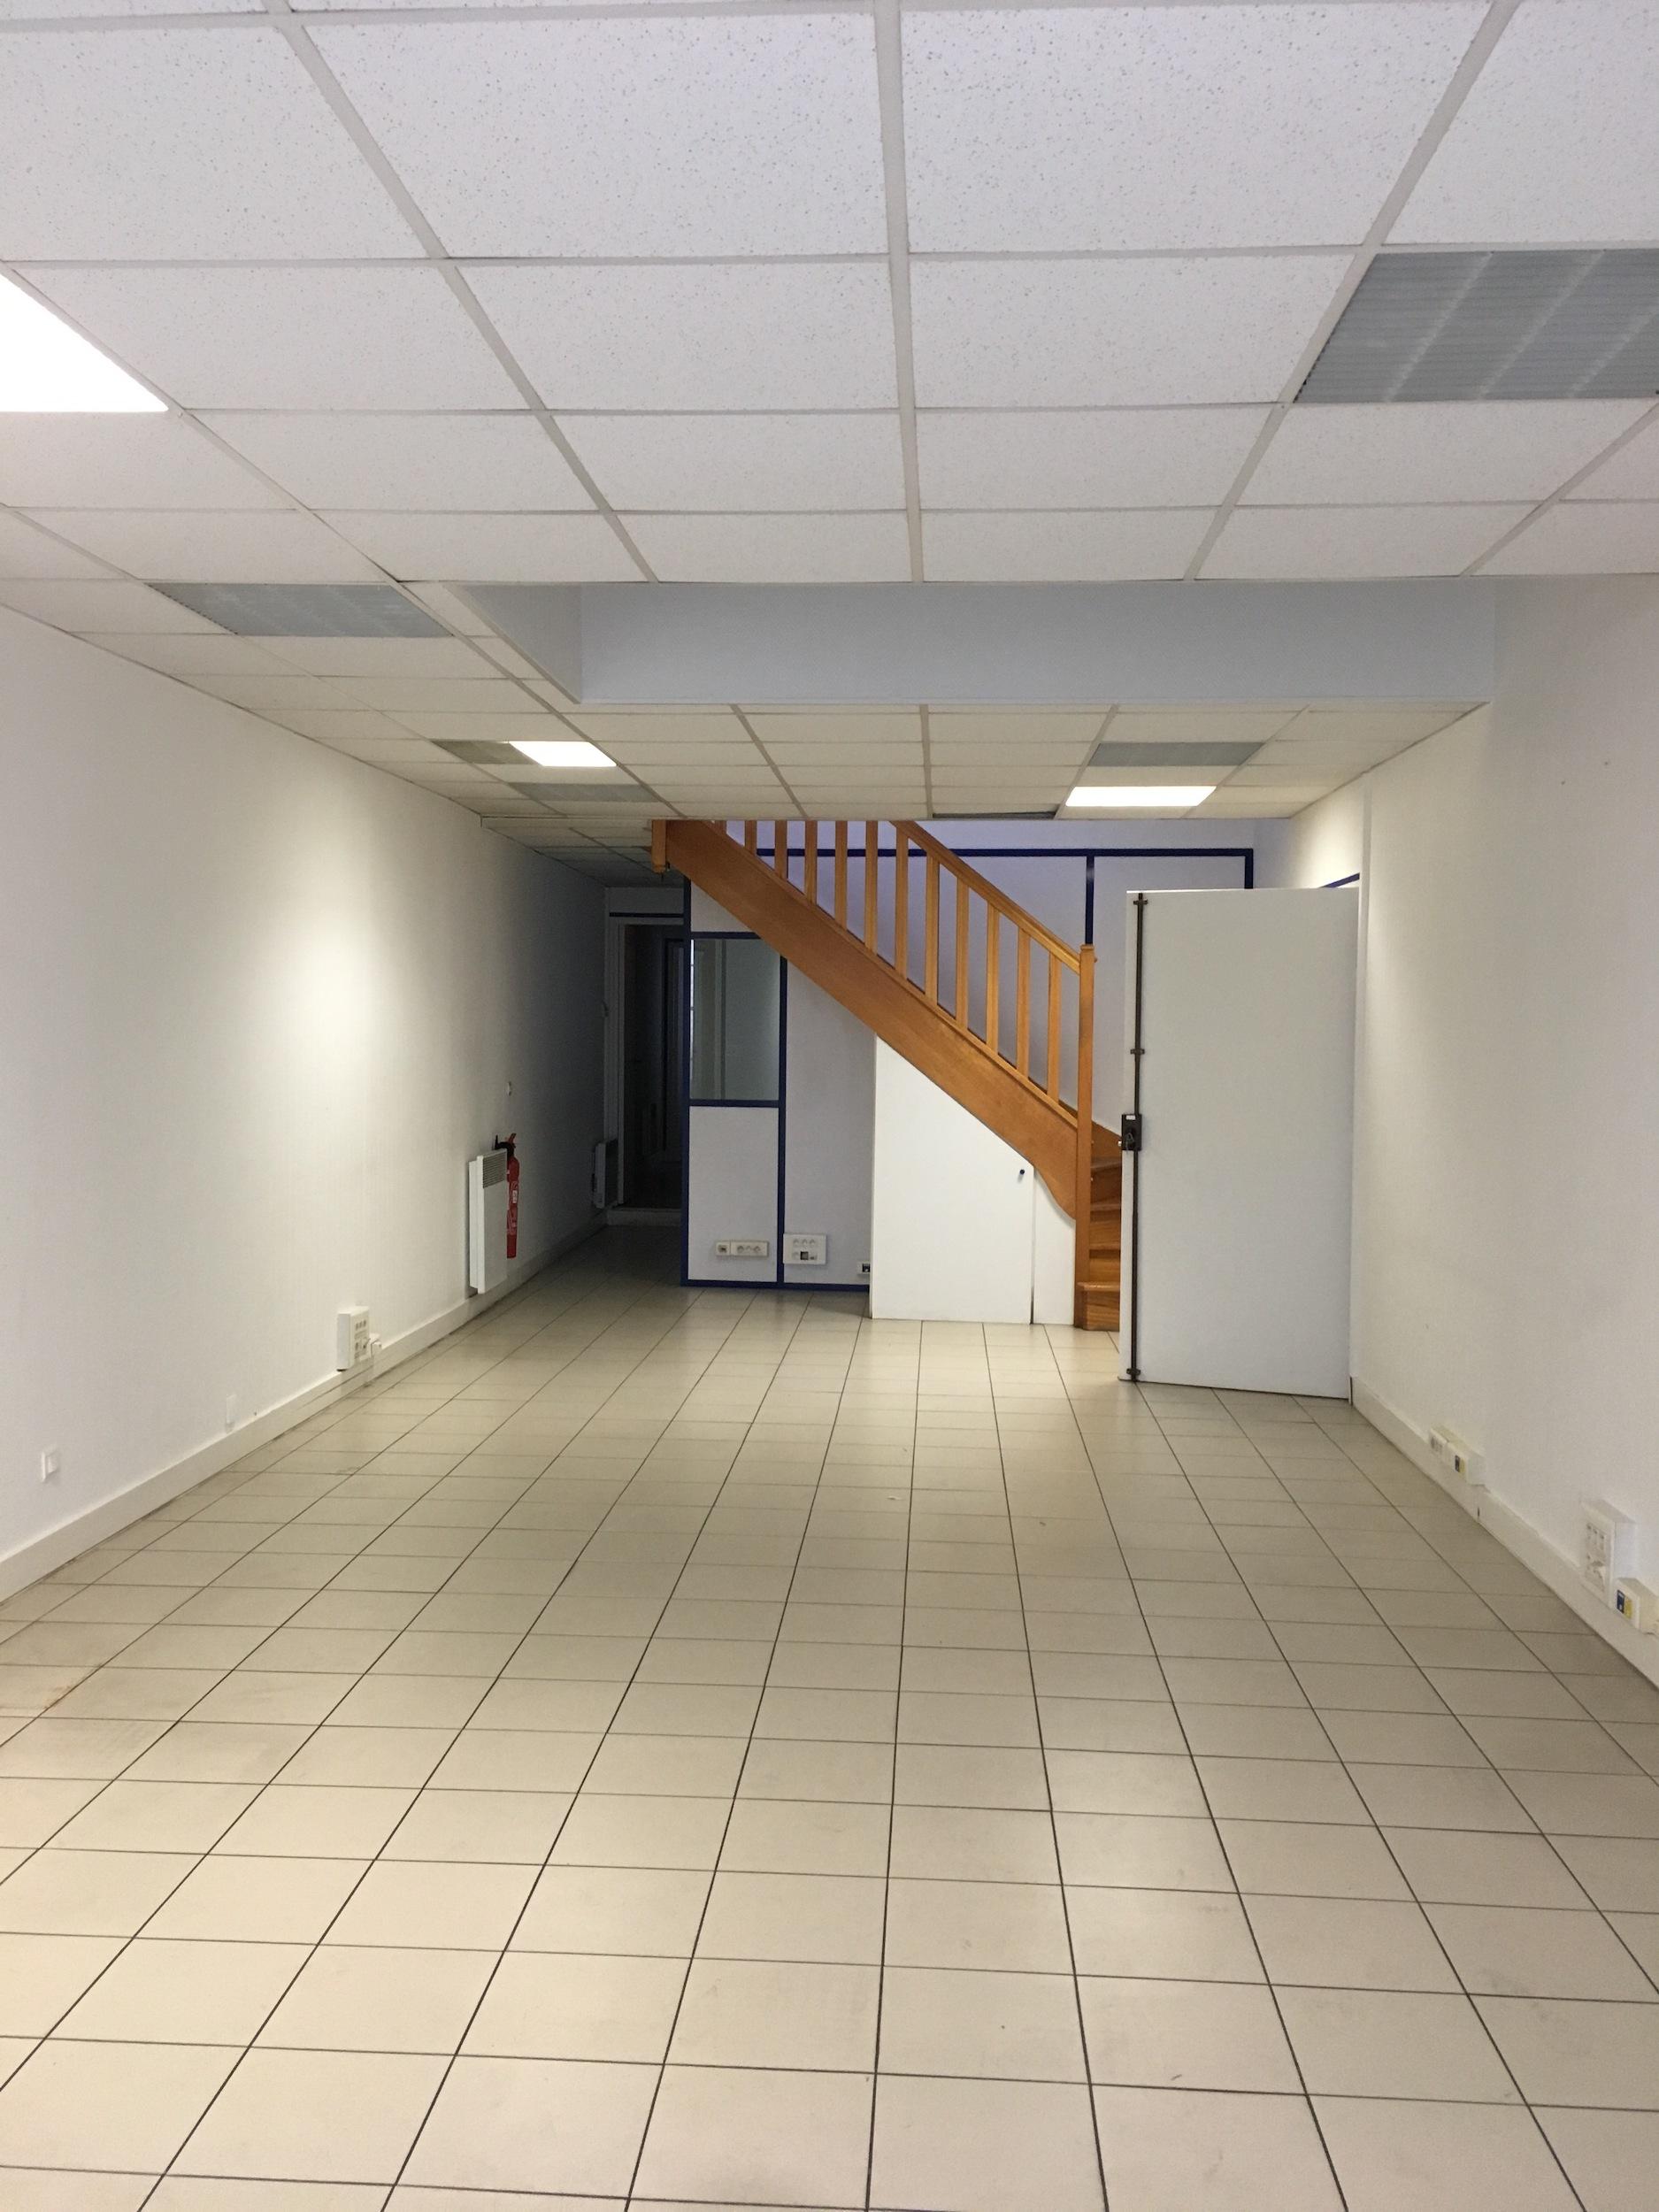 Renovation-boutique-decoration-lagny-77-carre-12-original